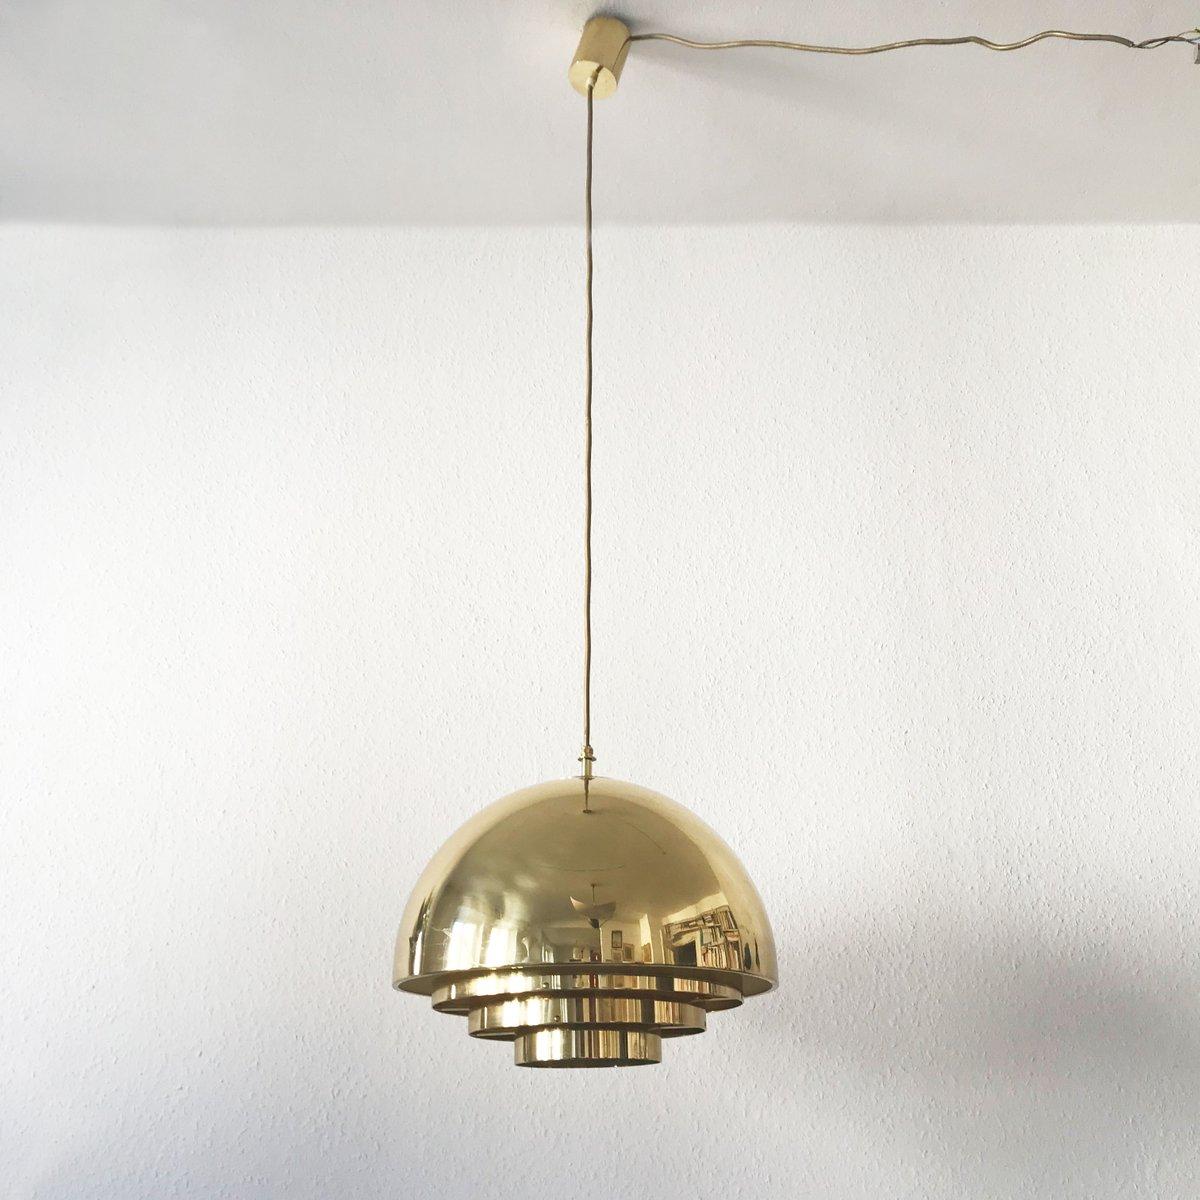 Mid century modern brass dome pendant lamp from vereinigte mid century modern brass dome pendant lamp from vereinigte werksttten aloadofball Choice Image